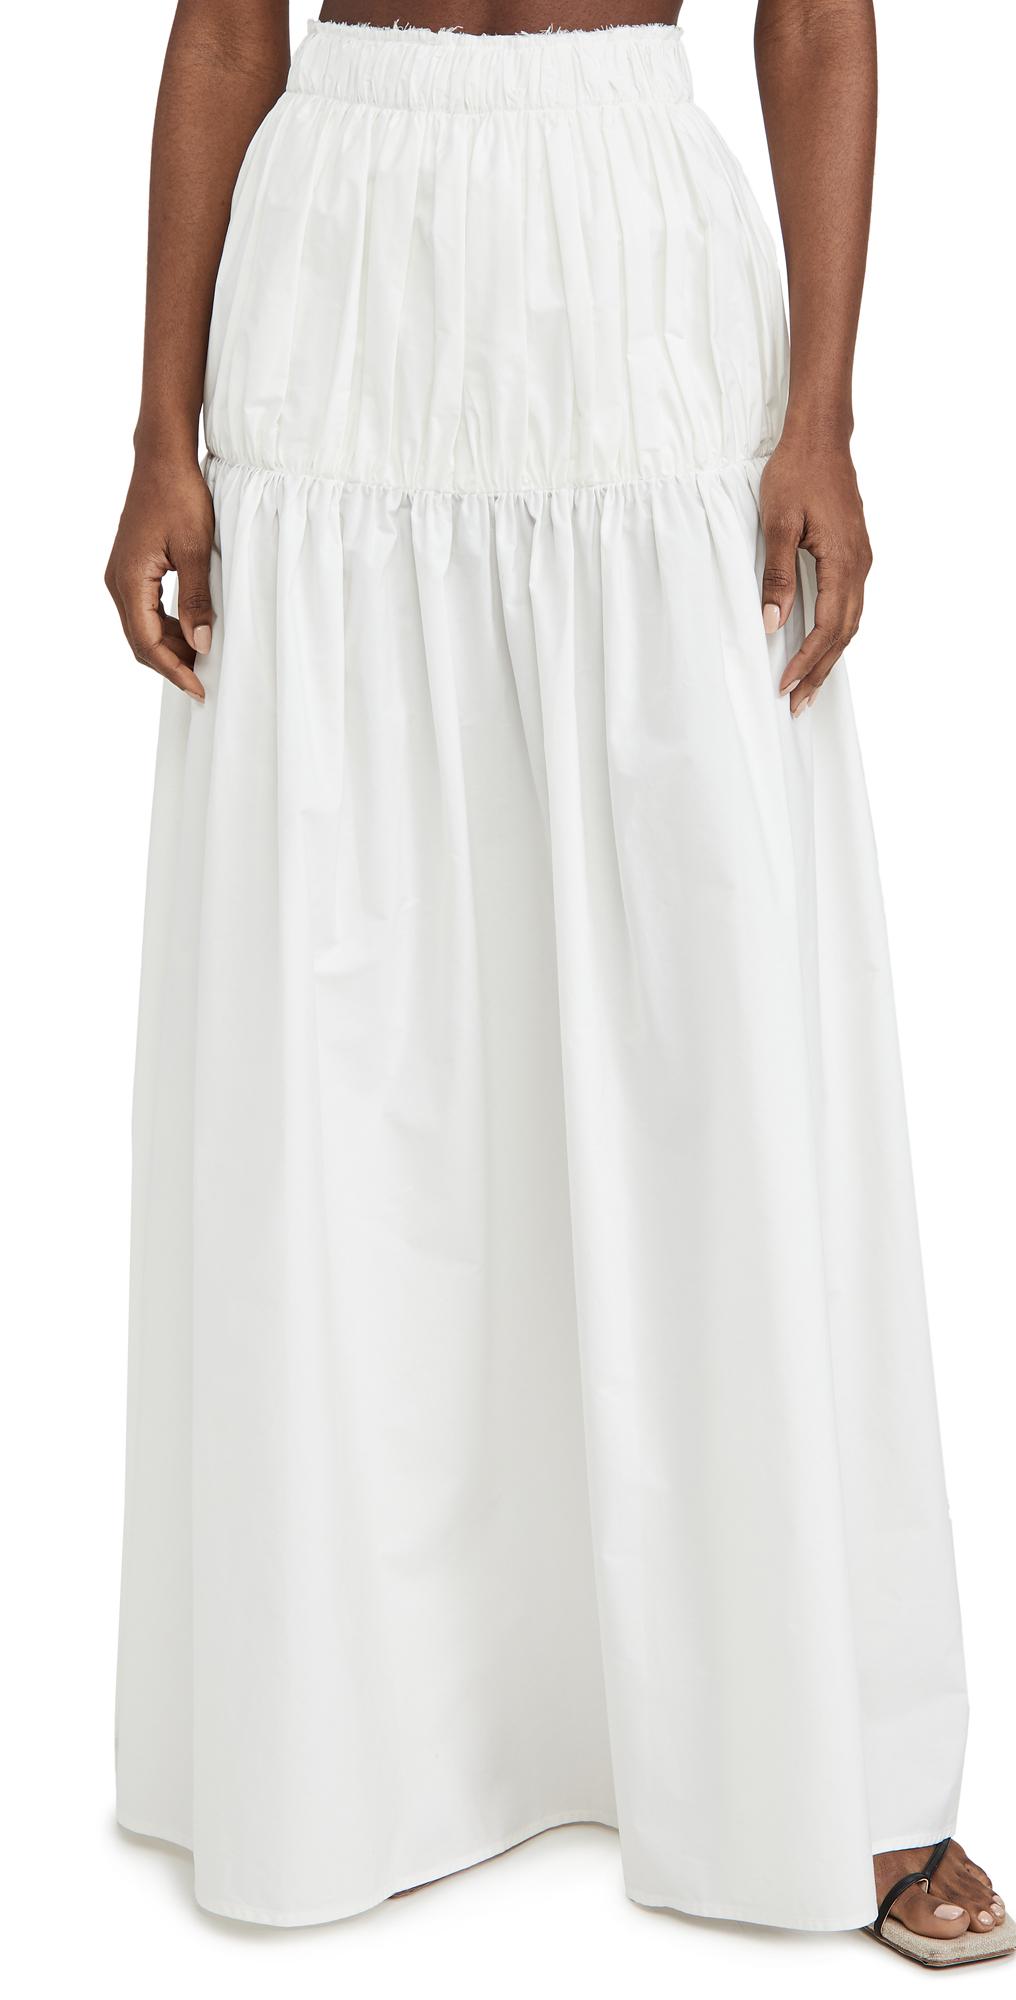 Ellery Sweep Me Up Skirt In White